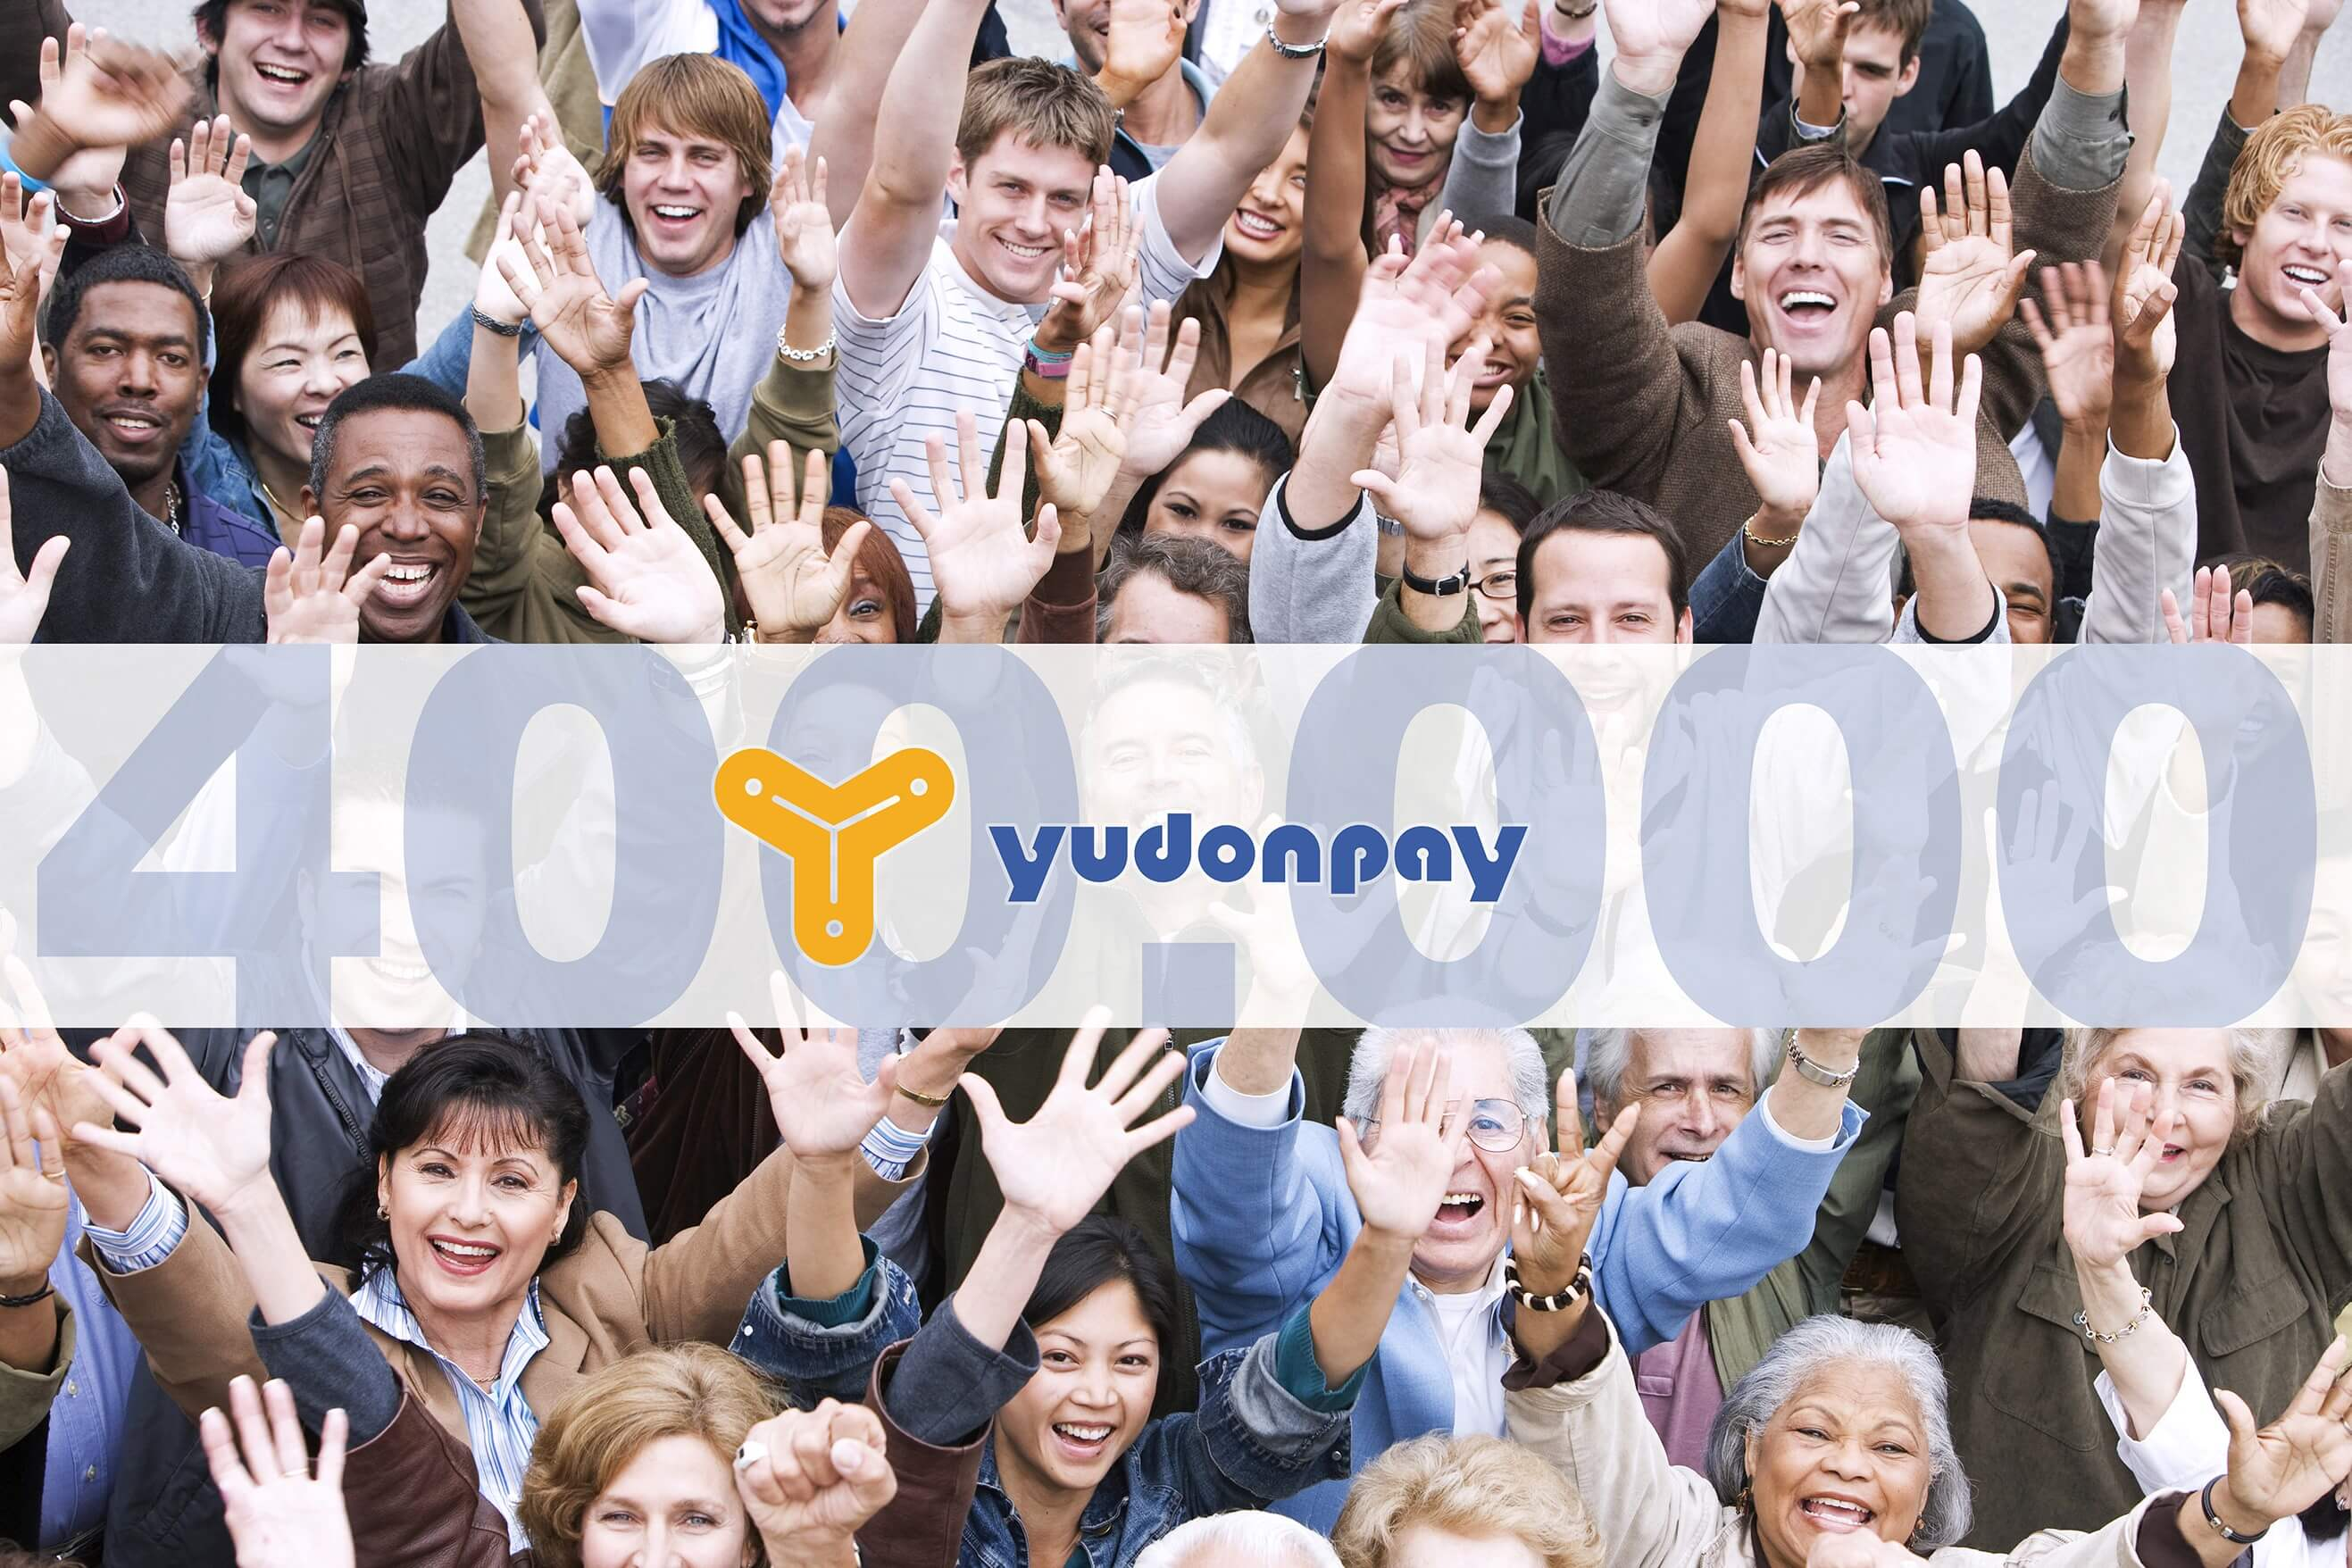 youdonpay-loyalty-app